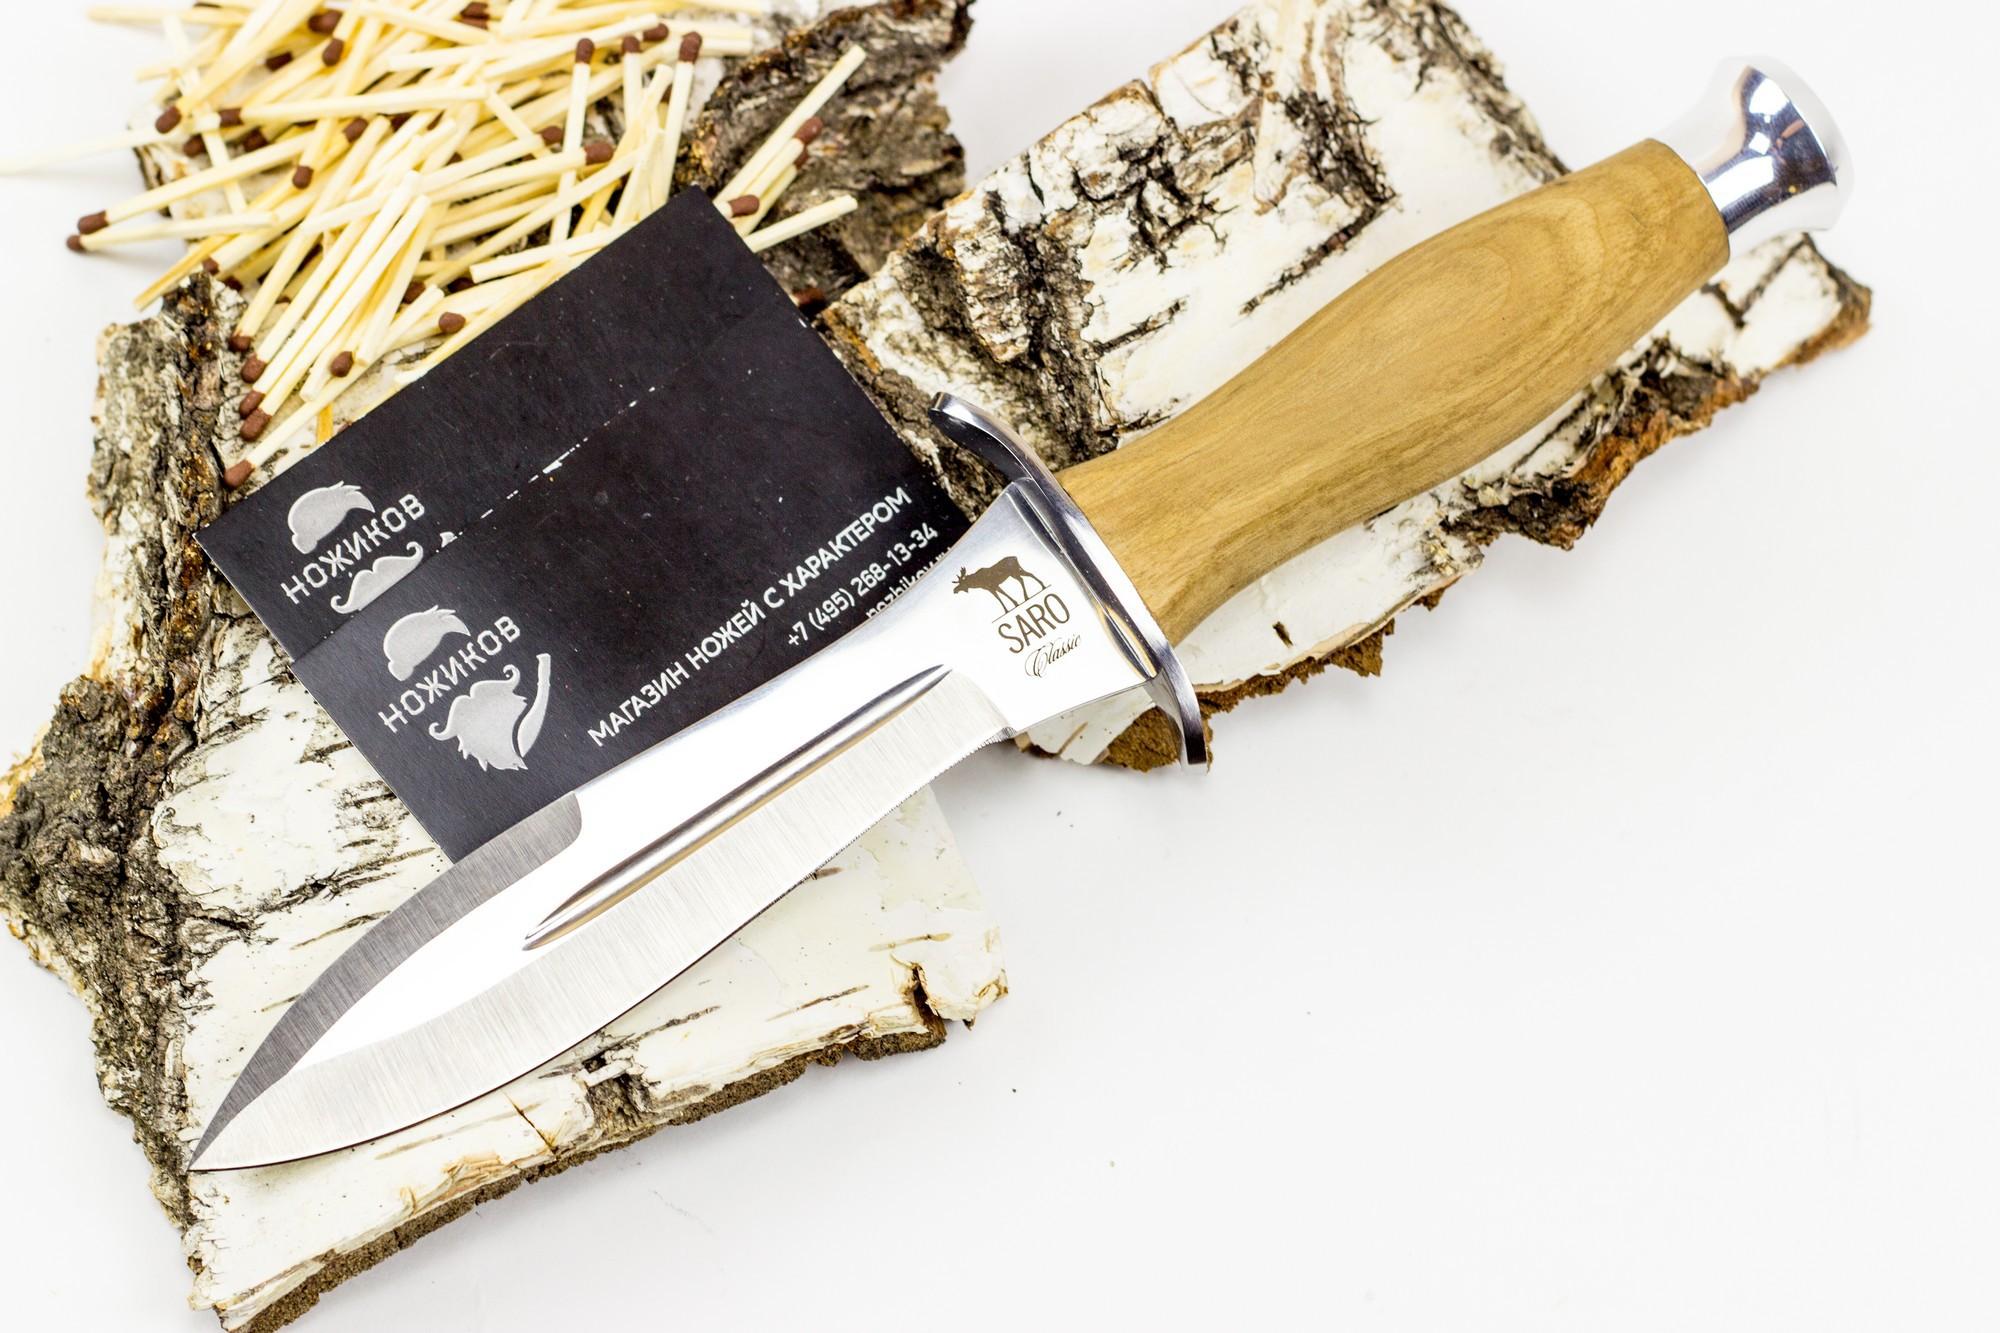 Нож Кречет, деревоНожи разведчика НР, Финки НКВД<br><br>